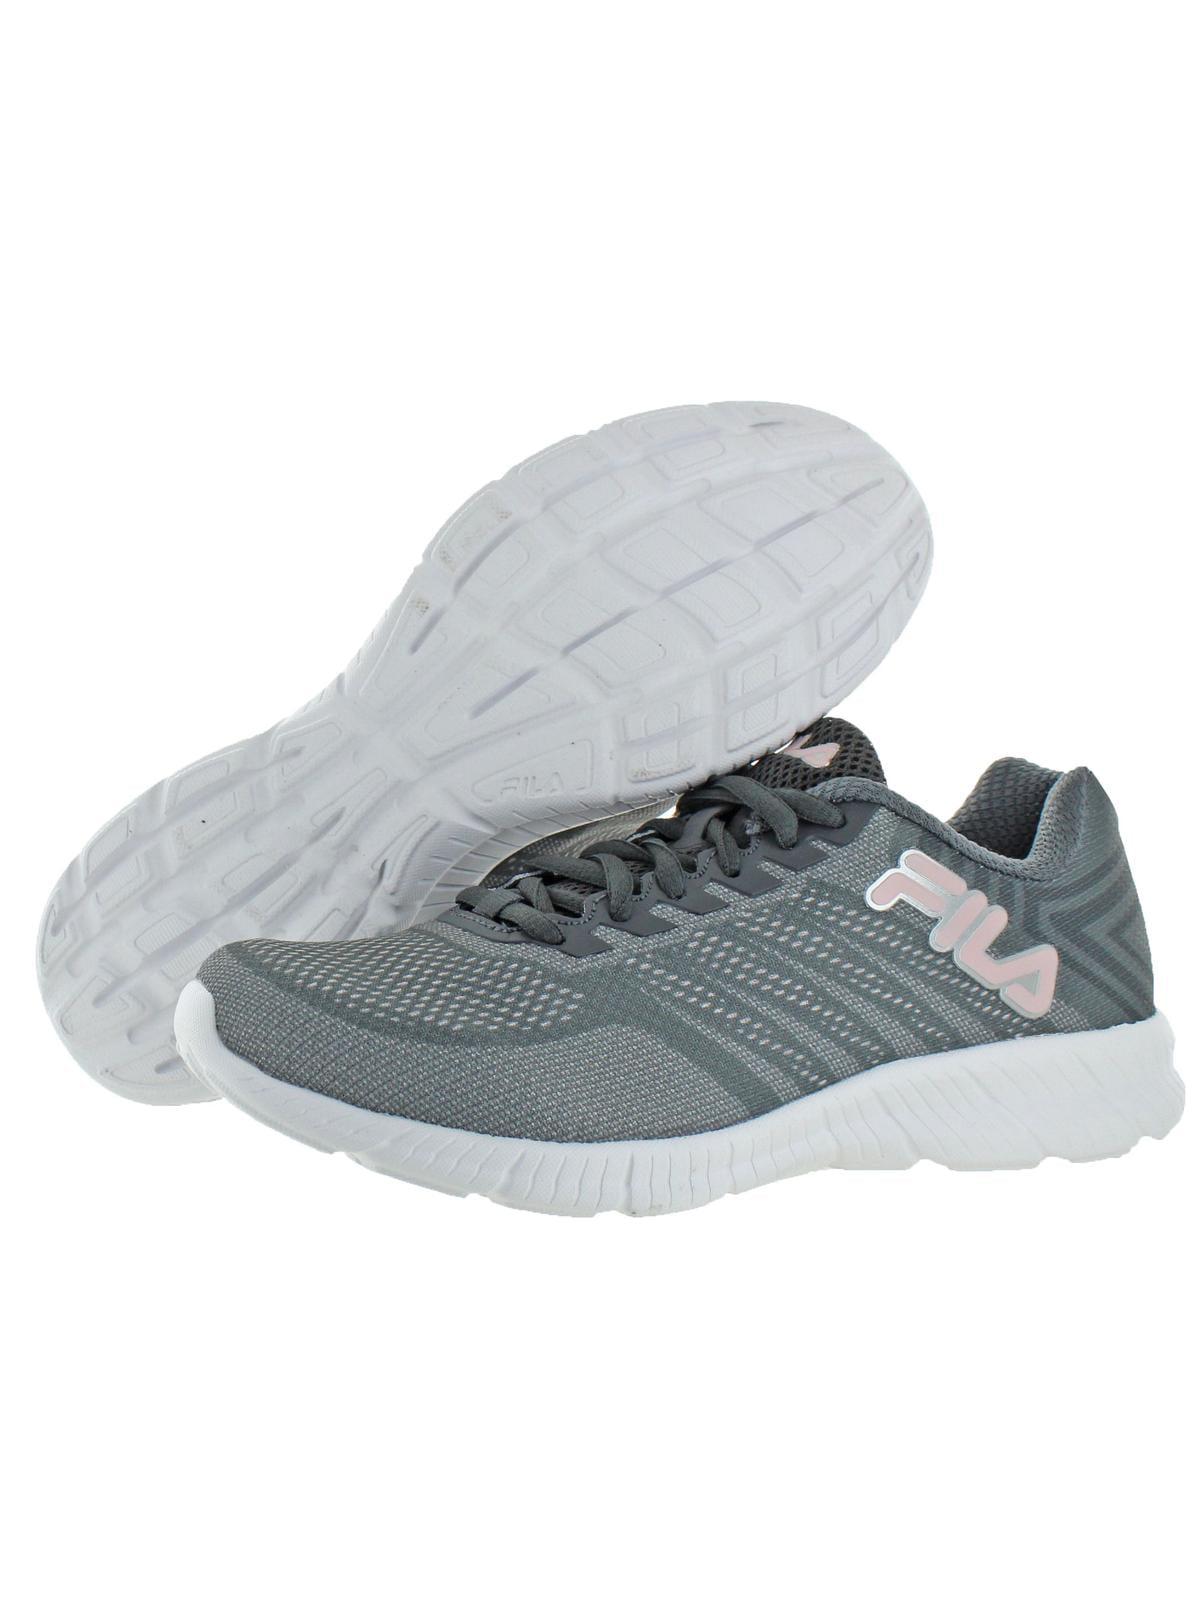 Fila Fila Womens Windracer 3 Breathable Running Shoes Gray